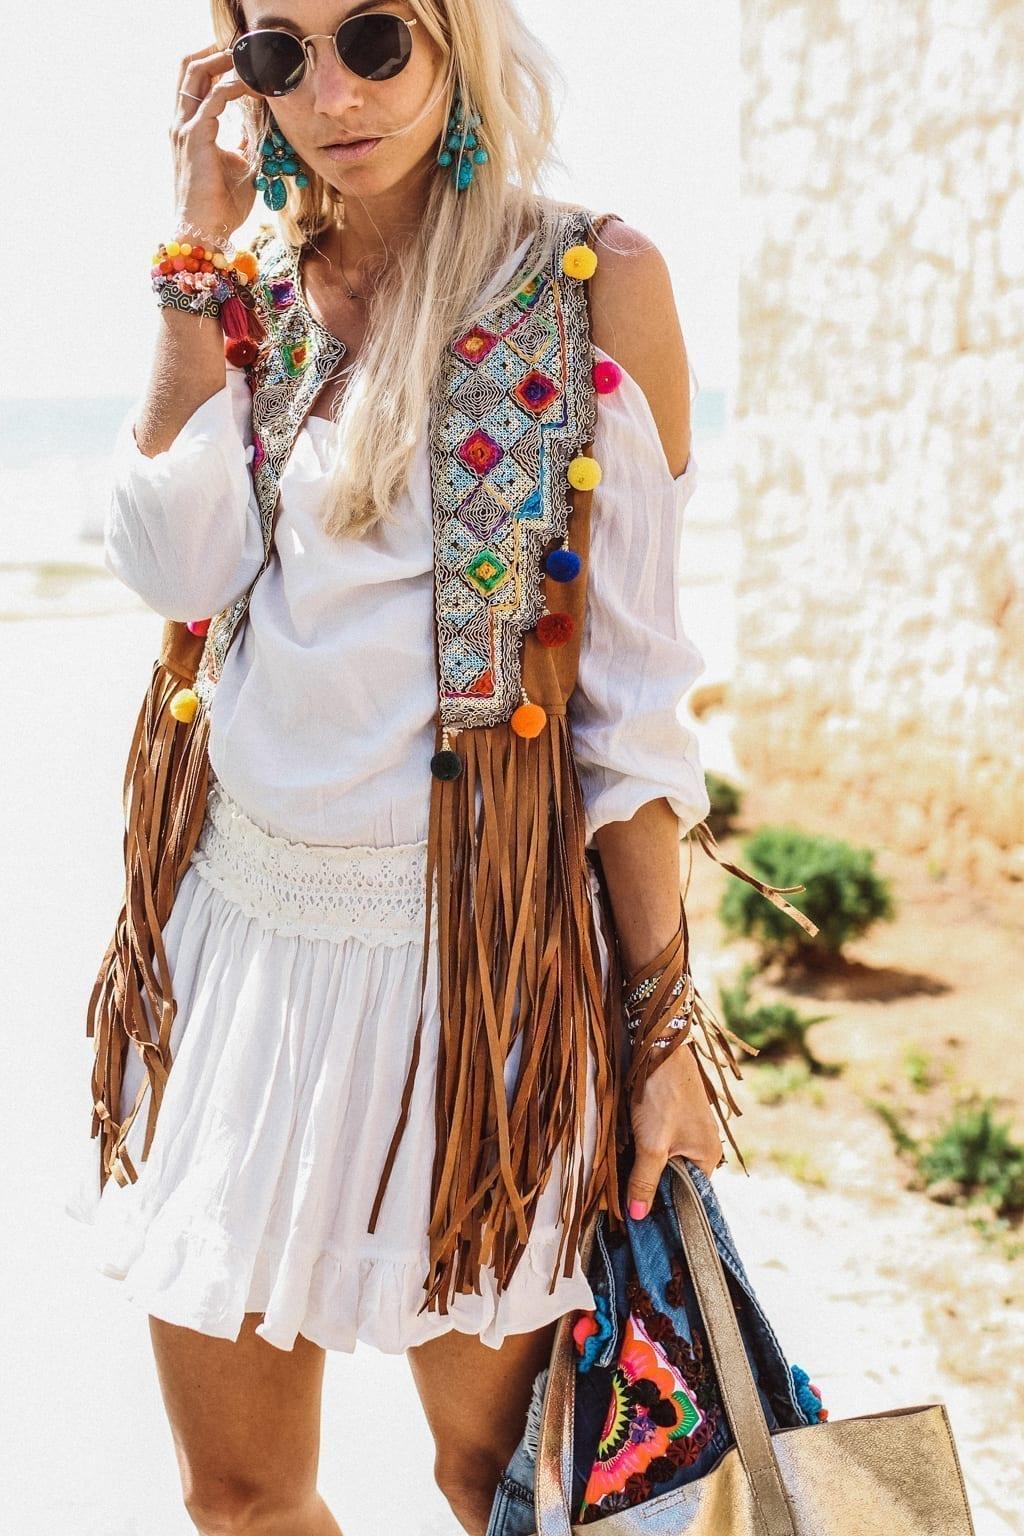 CK1605_Constantly-K-Karin-Kaswurm-Georg-Teigl-Ibiza-Holiday-Spain-Blog-Street-Style-Fashion-Boho-Chic-Beach-Style-2